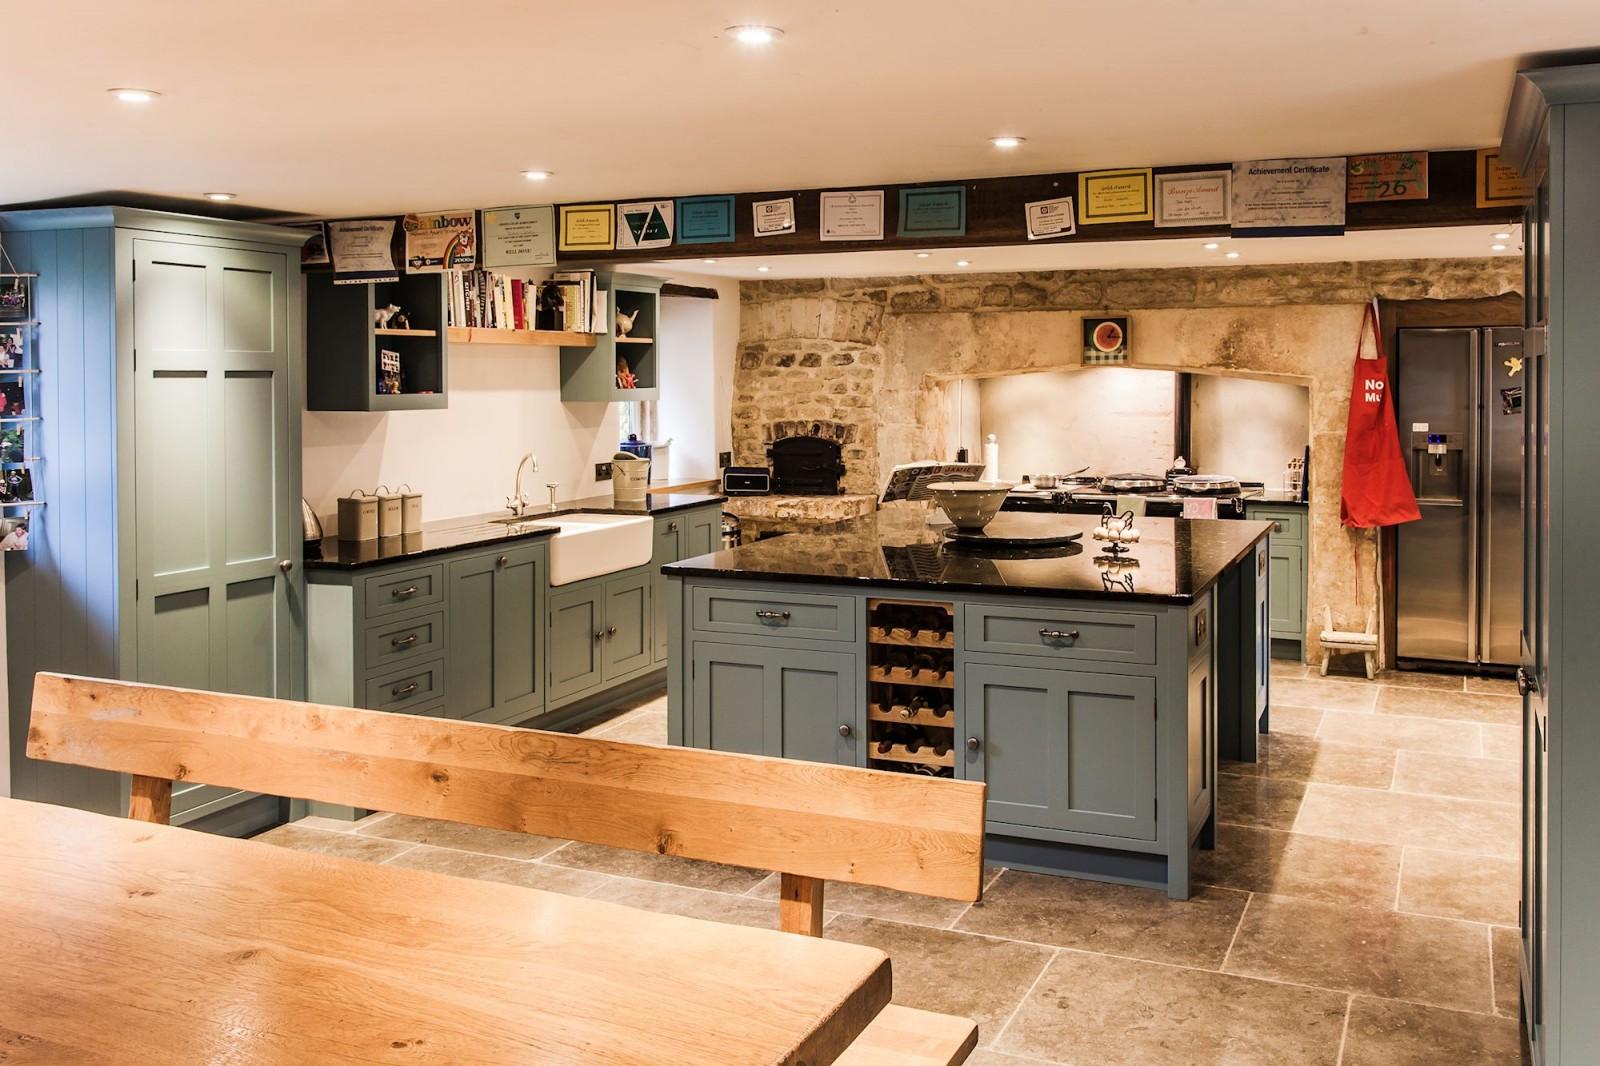 Painted Kitchen Painted Kitchen Bath Somerset Mark Stones Welsh Kitchens